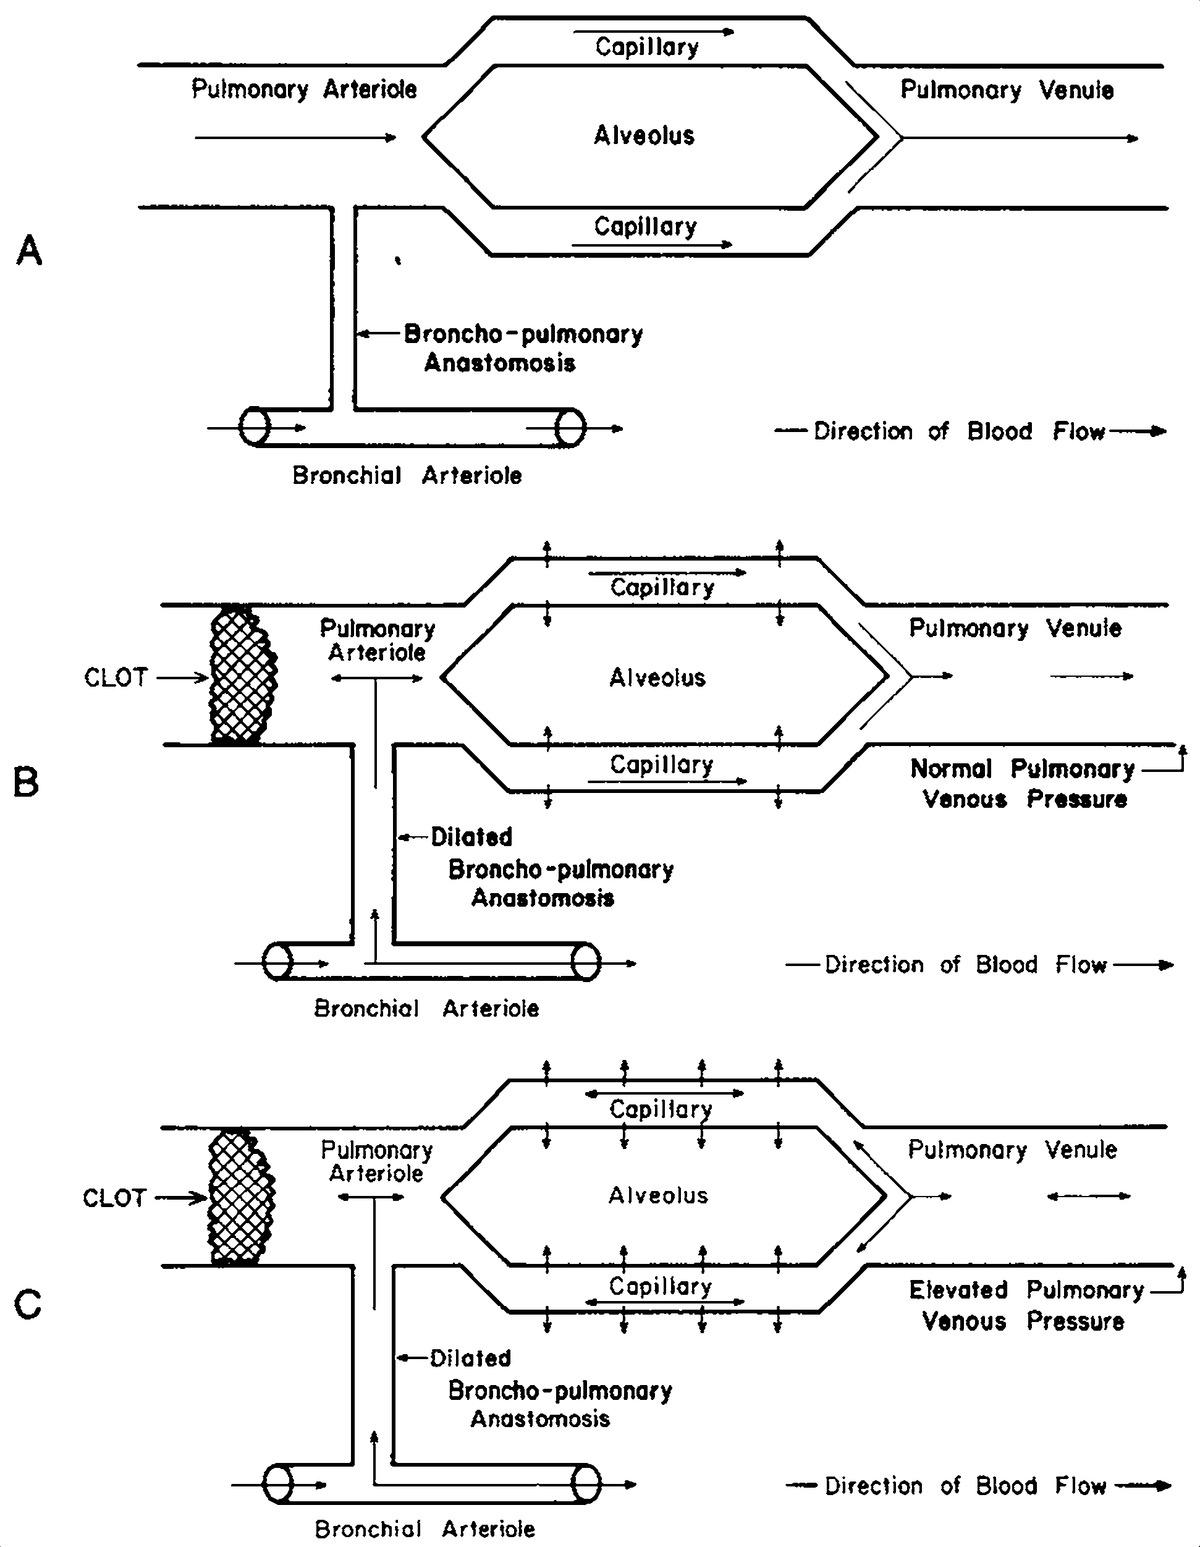 Pulmonary Embolism Pulmonary Hemorrhage And Pulmonary